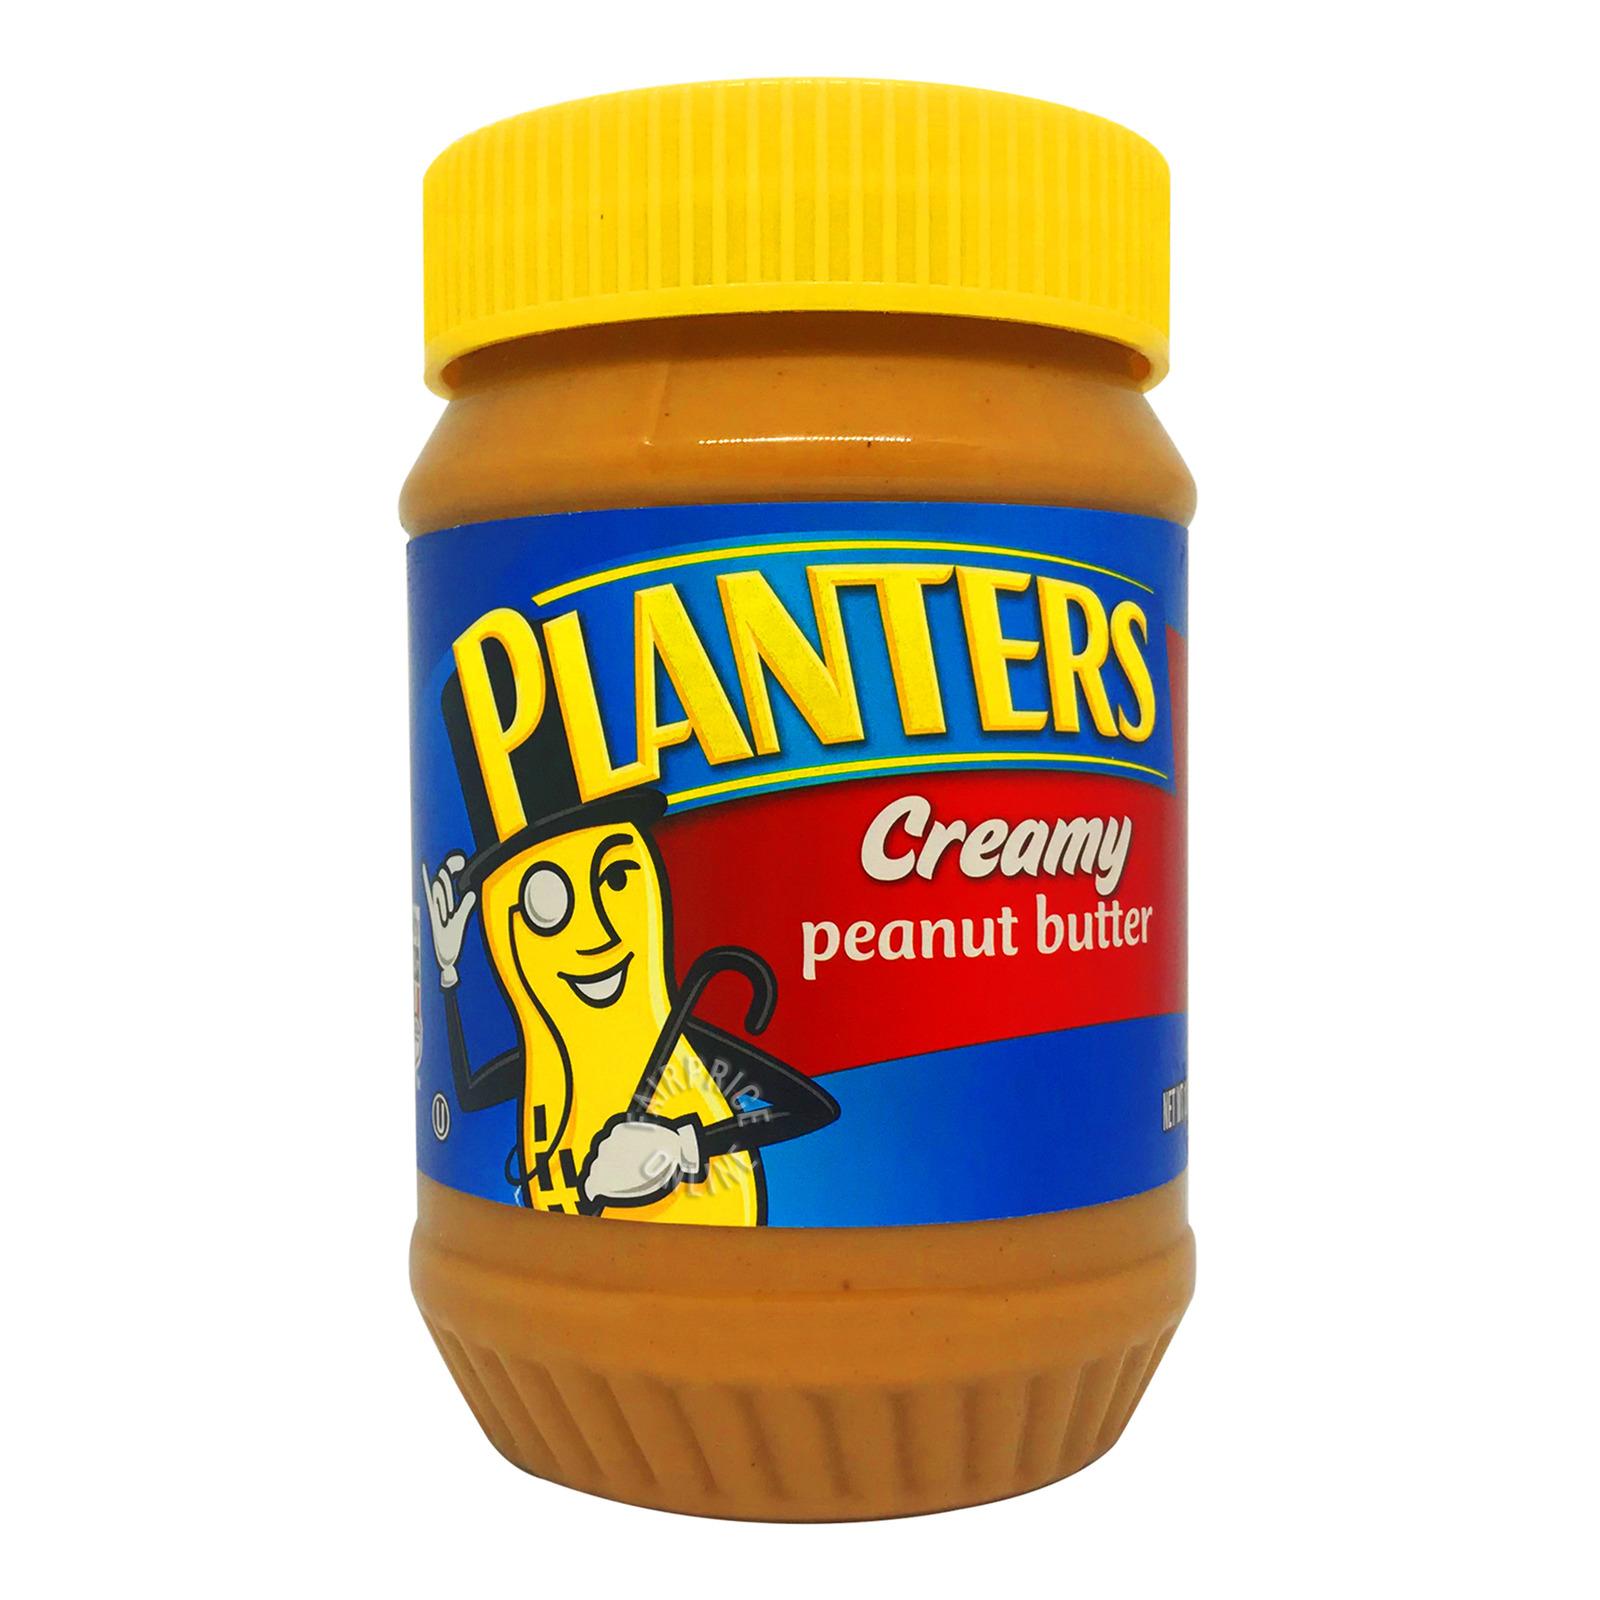 Planters Peanut Butter Spread - Creamy